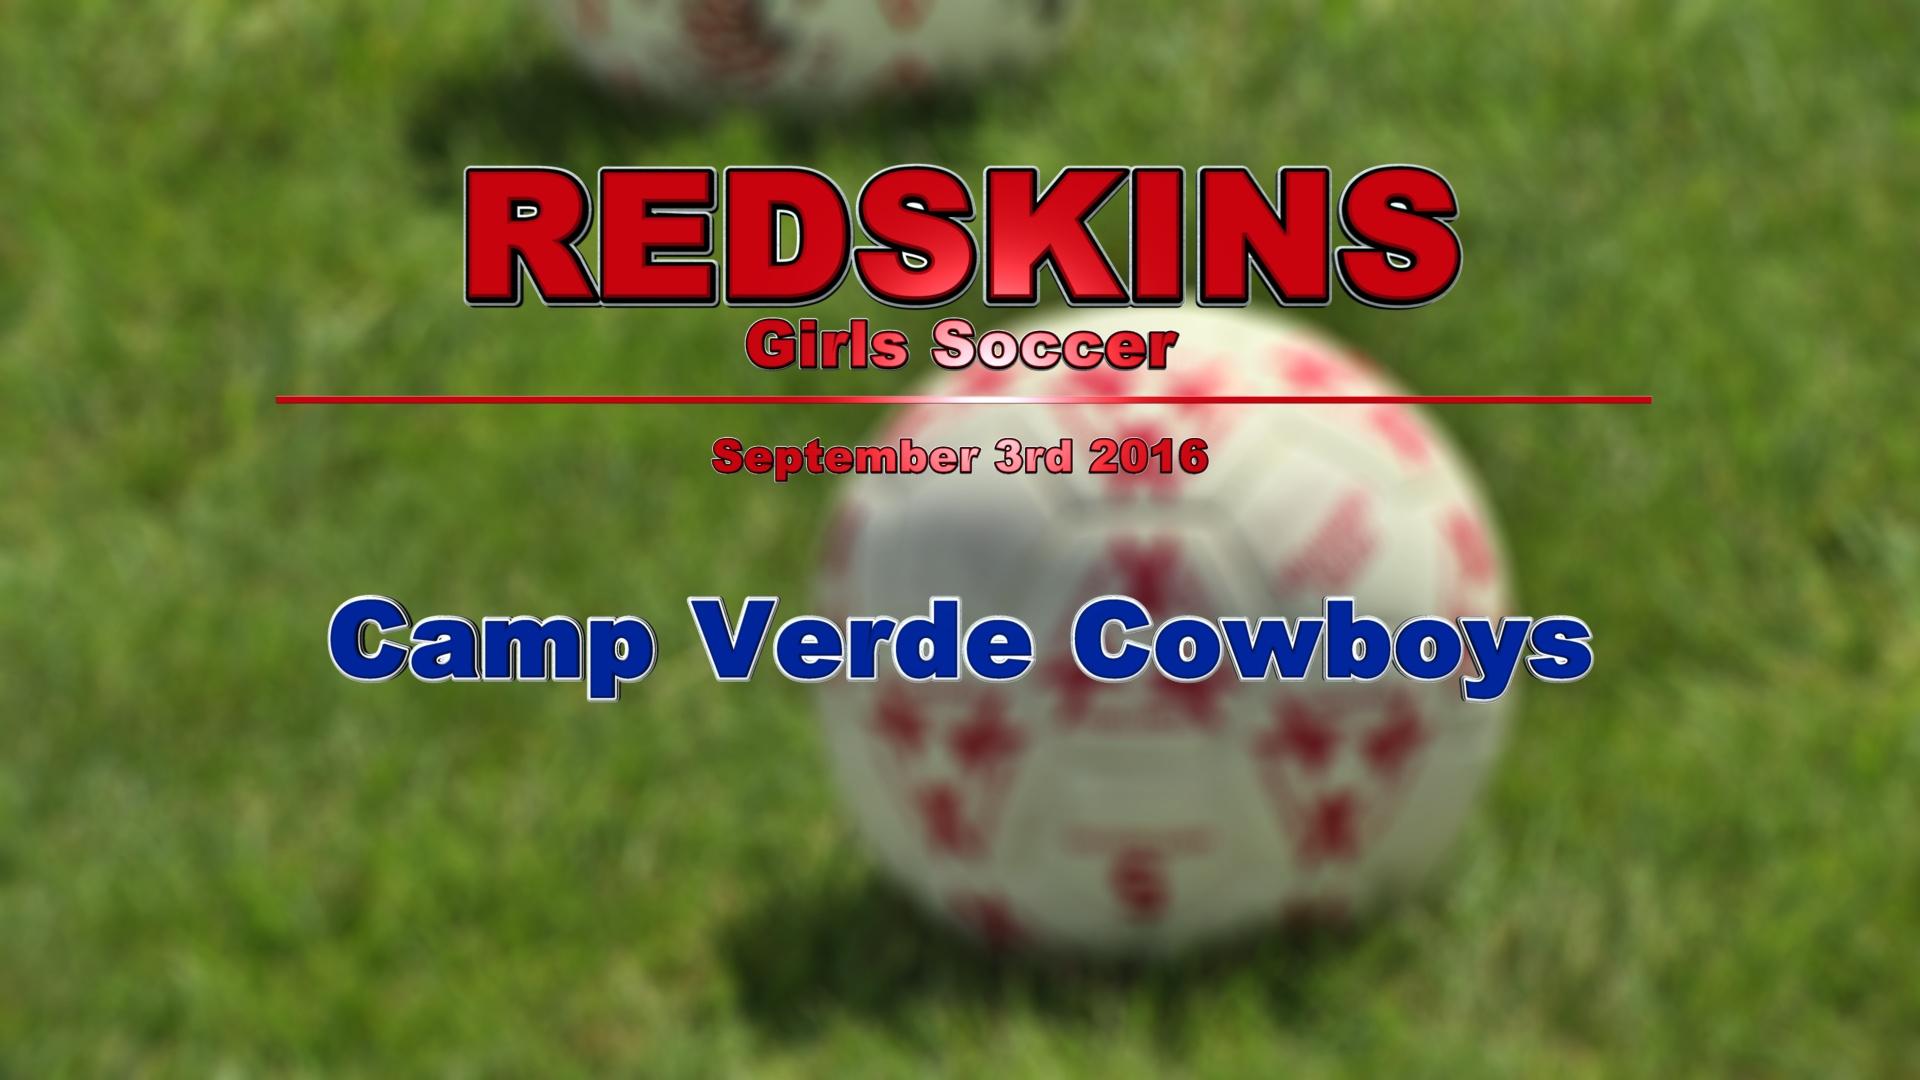 2016-09-girlssoccer-campverde